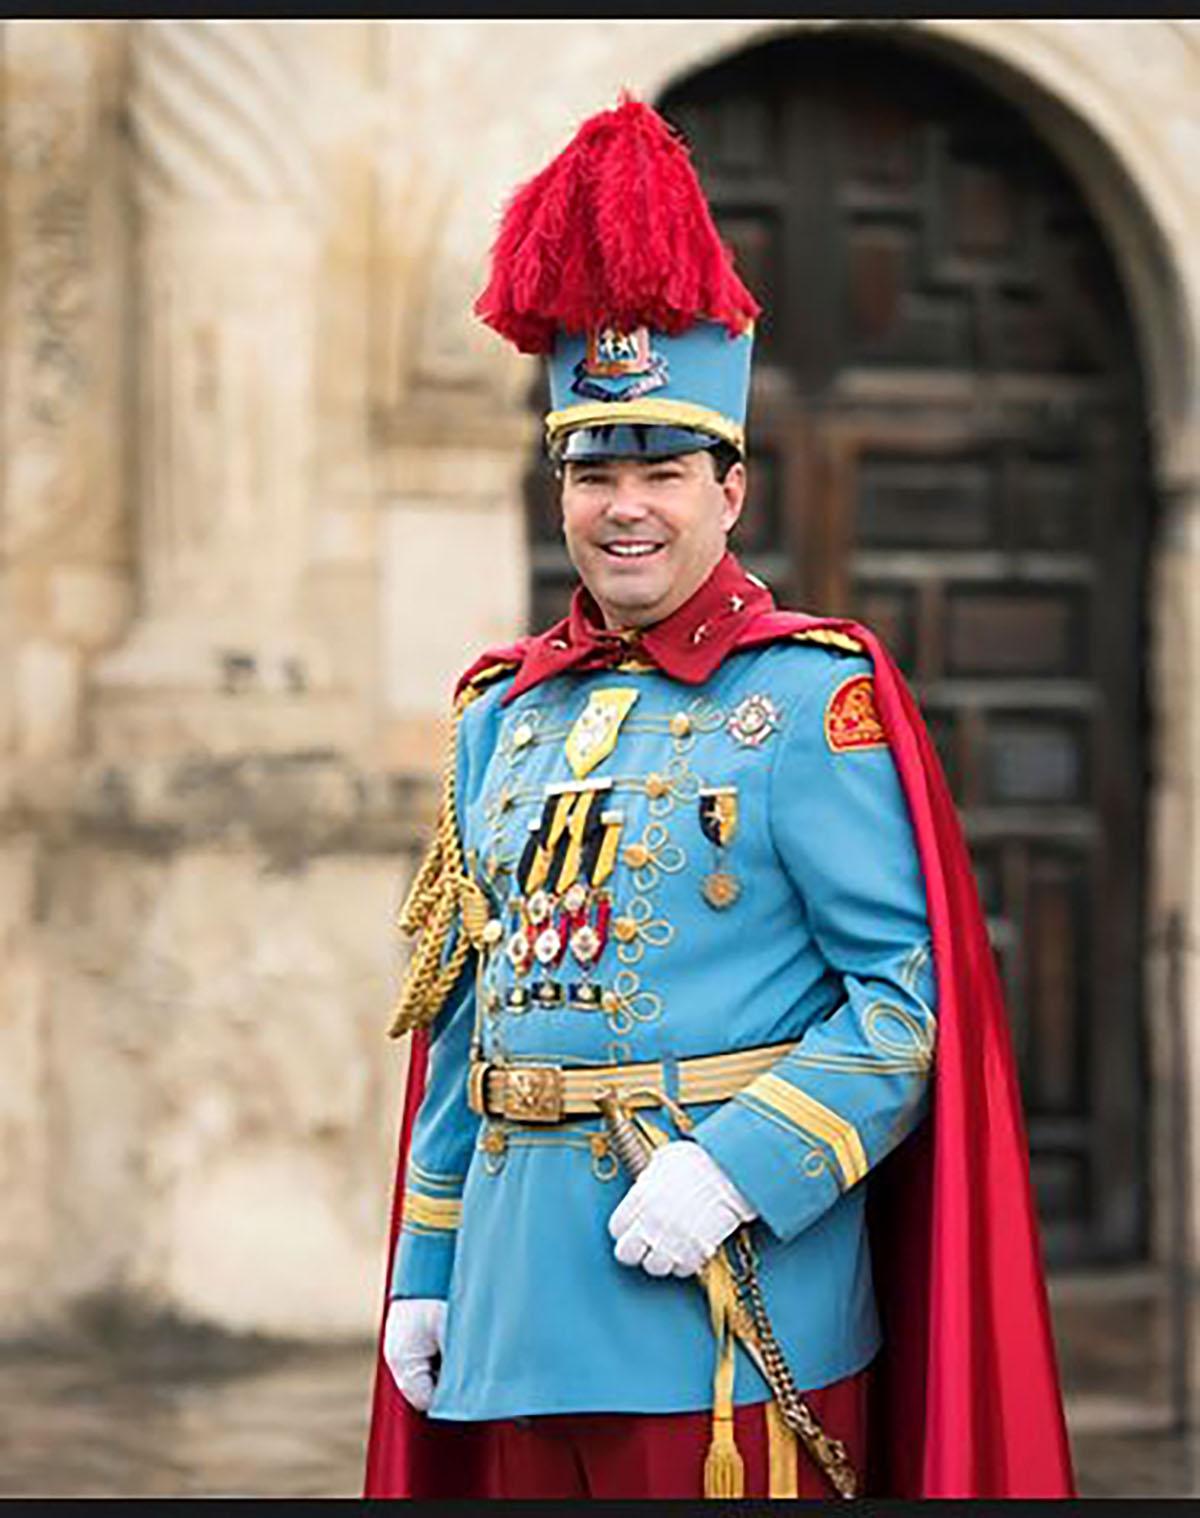 King Antonio XCVII Roger Hill III Courtesy of JB Lyde of Parish Photography